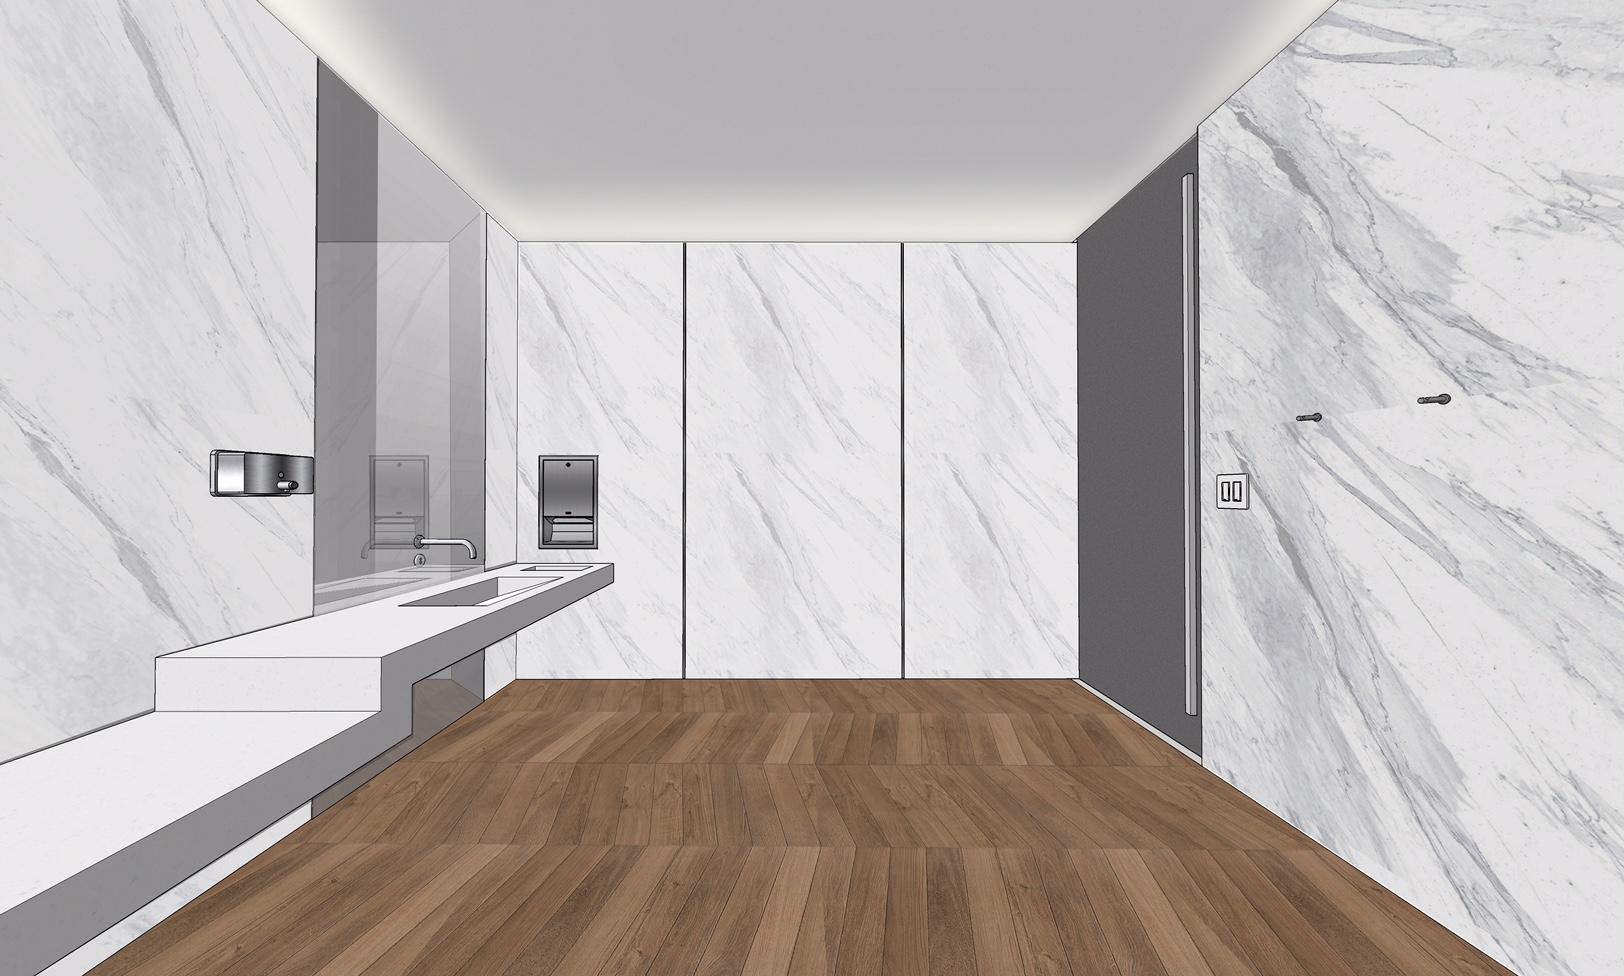 St Armands Public Bathrooms Interior Perspective.jpg